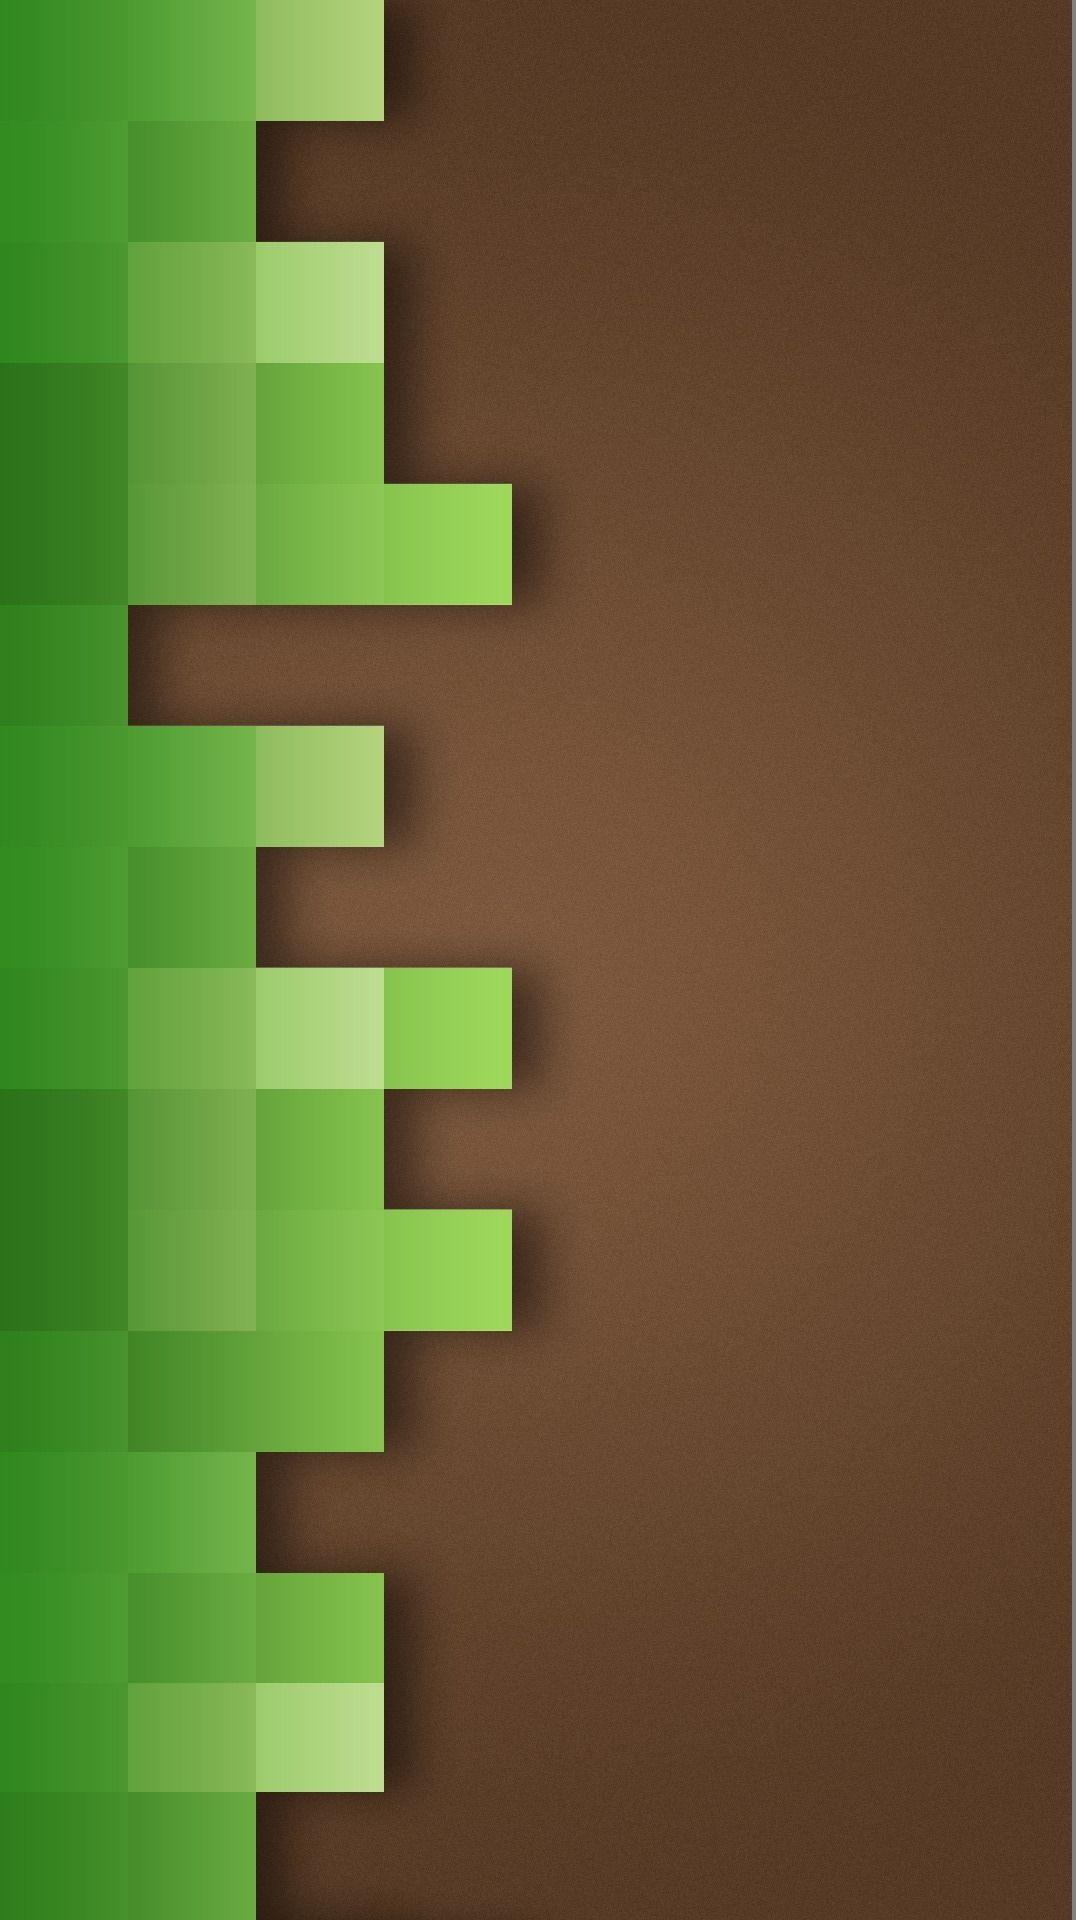 Pin by jennifer g on Minecraft Cellphone wallpaper